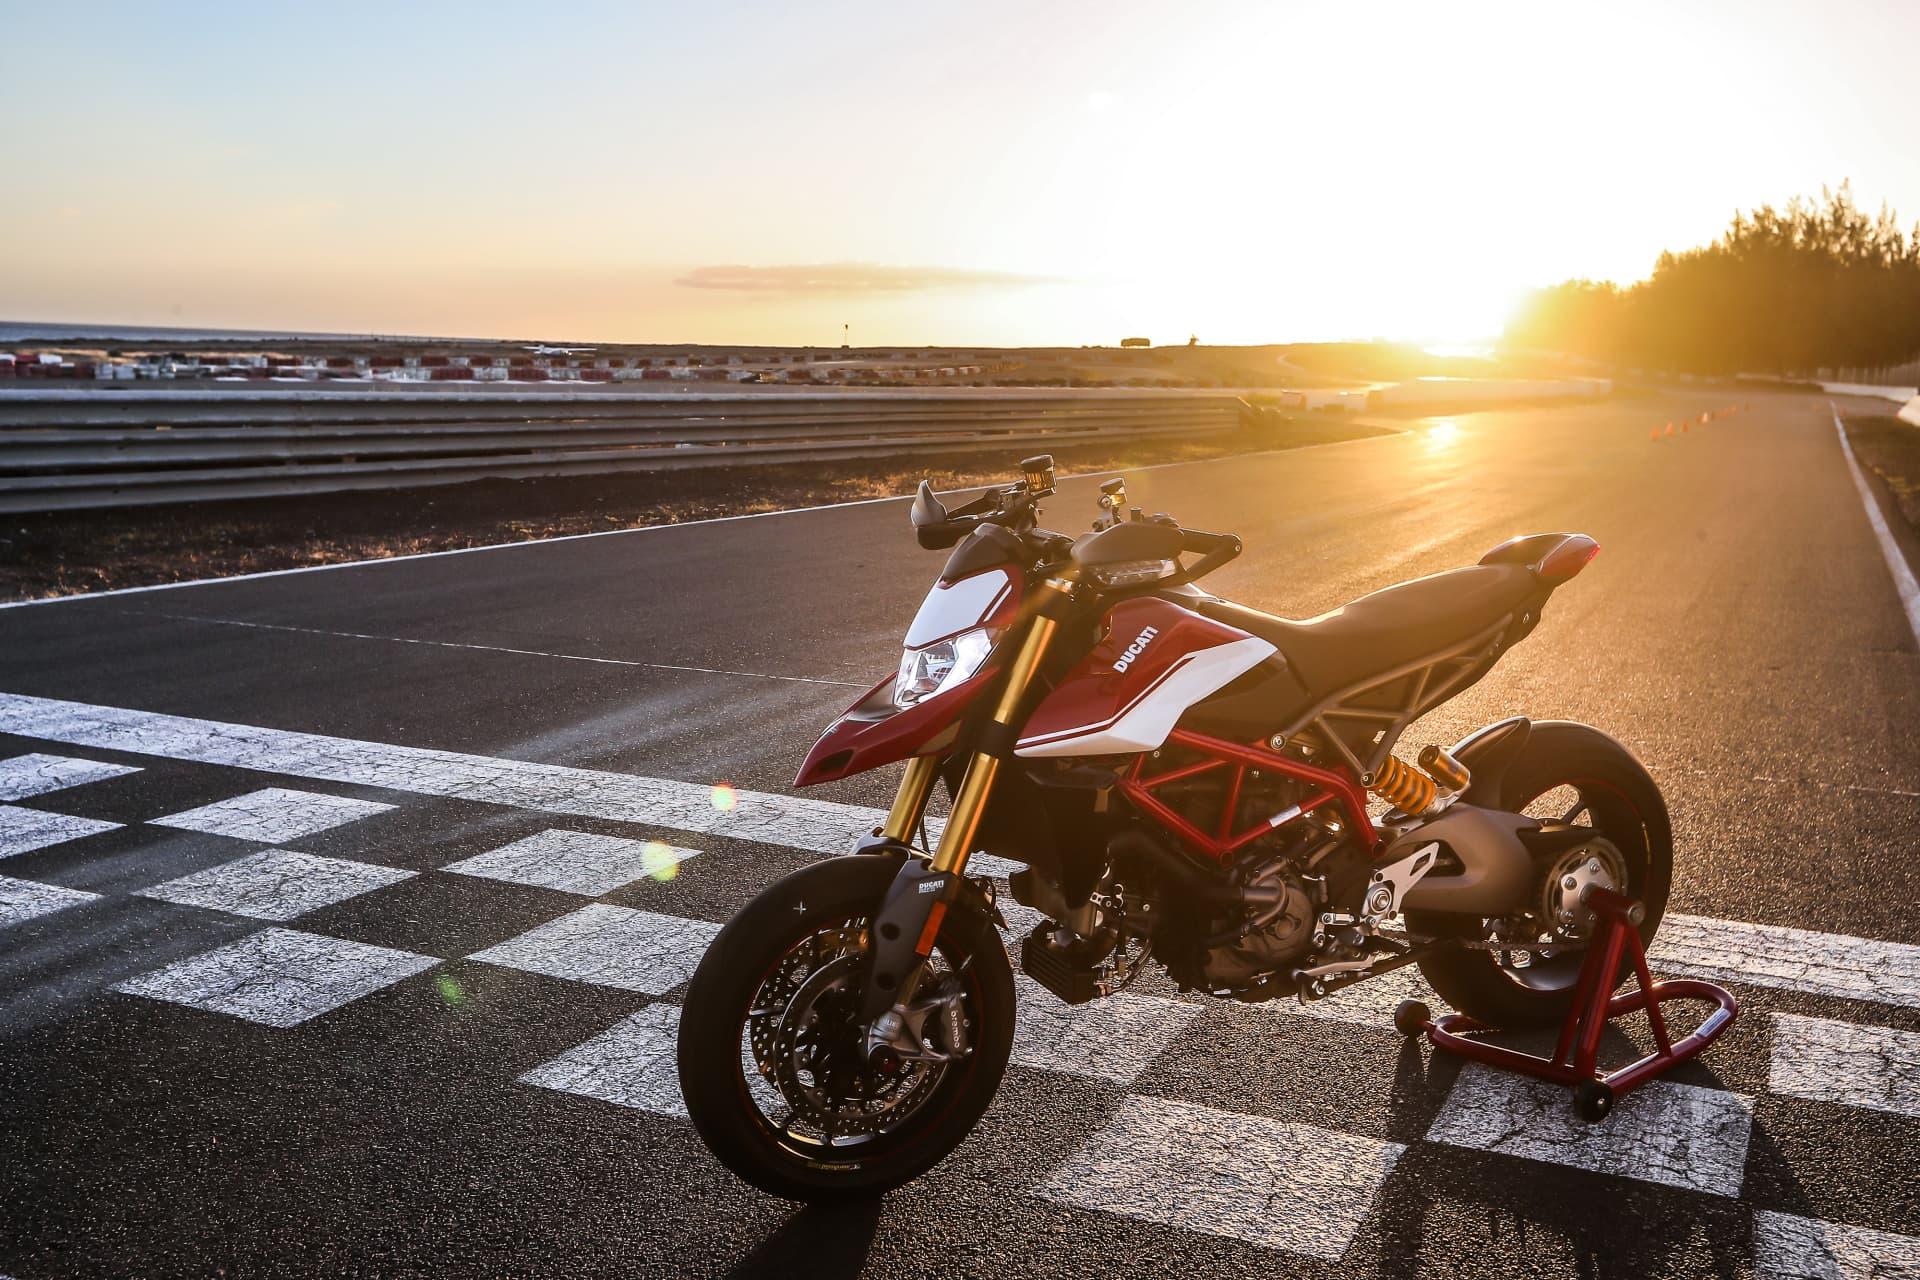 Ducati Hypermotard 950 Sp Static 01 Uc70301 Mid